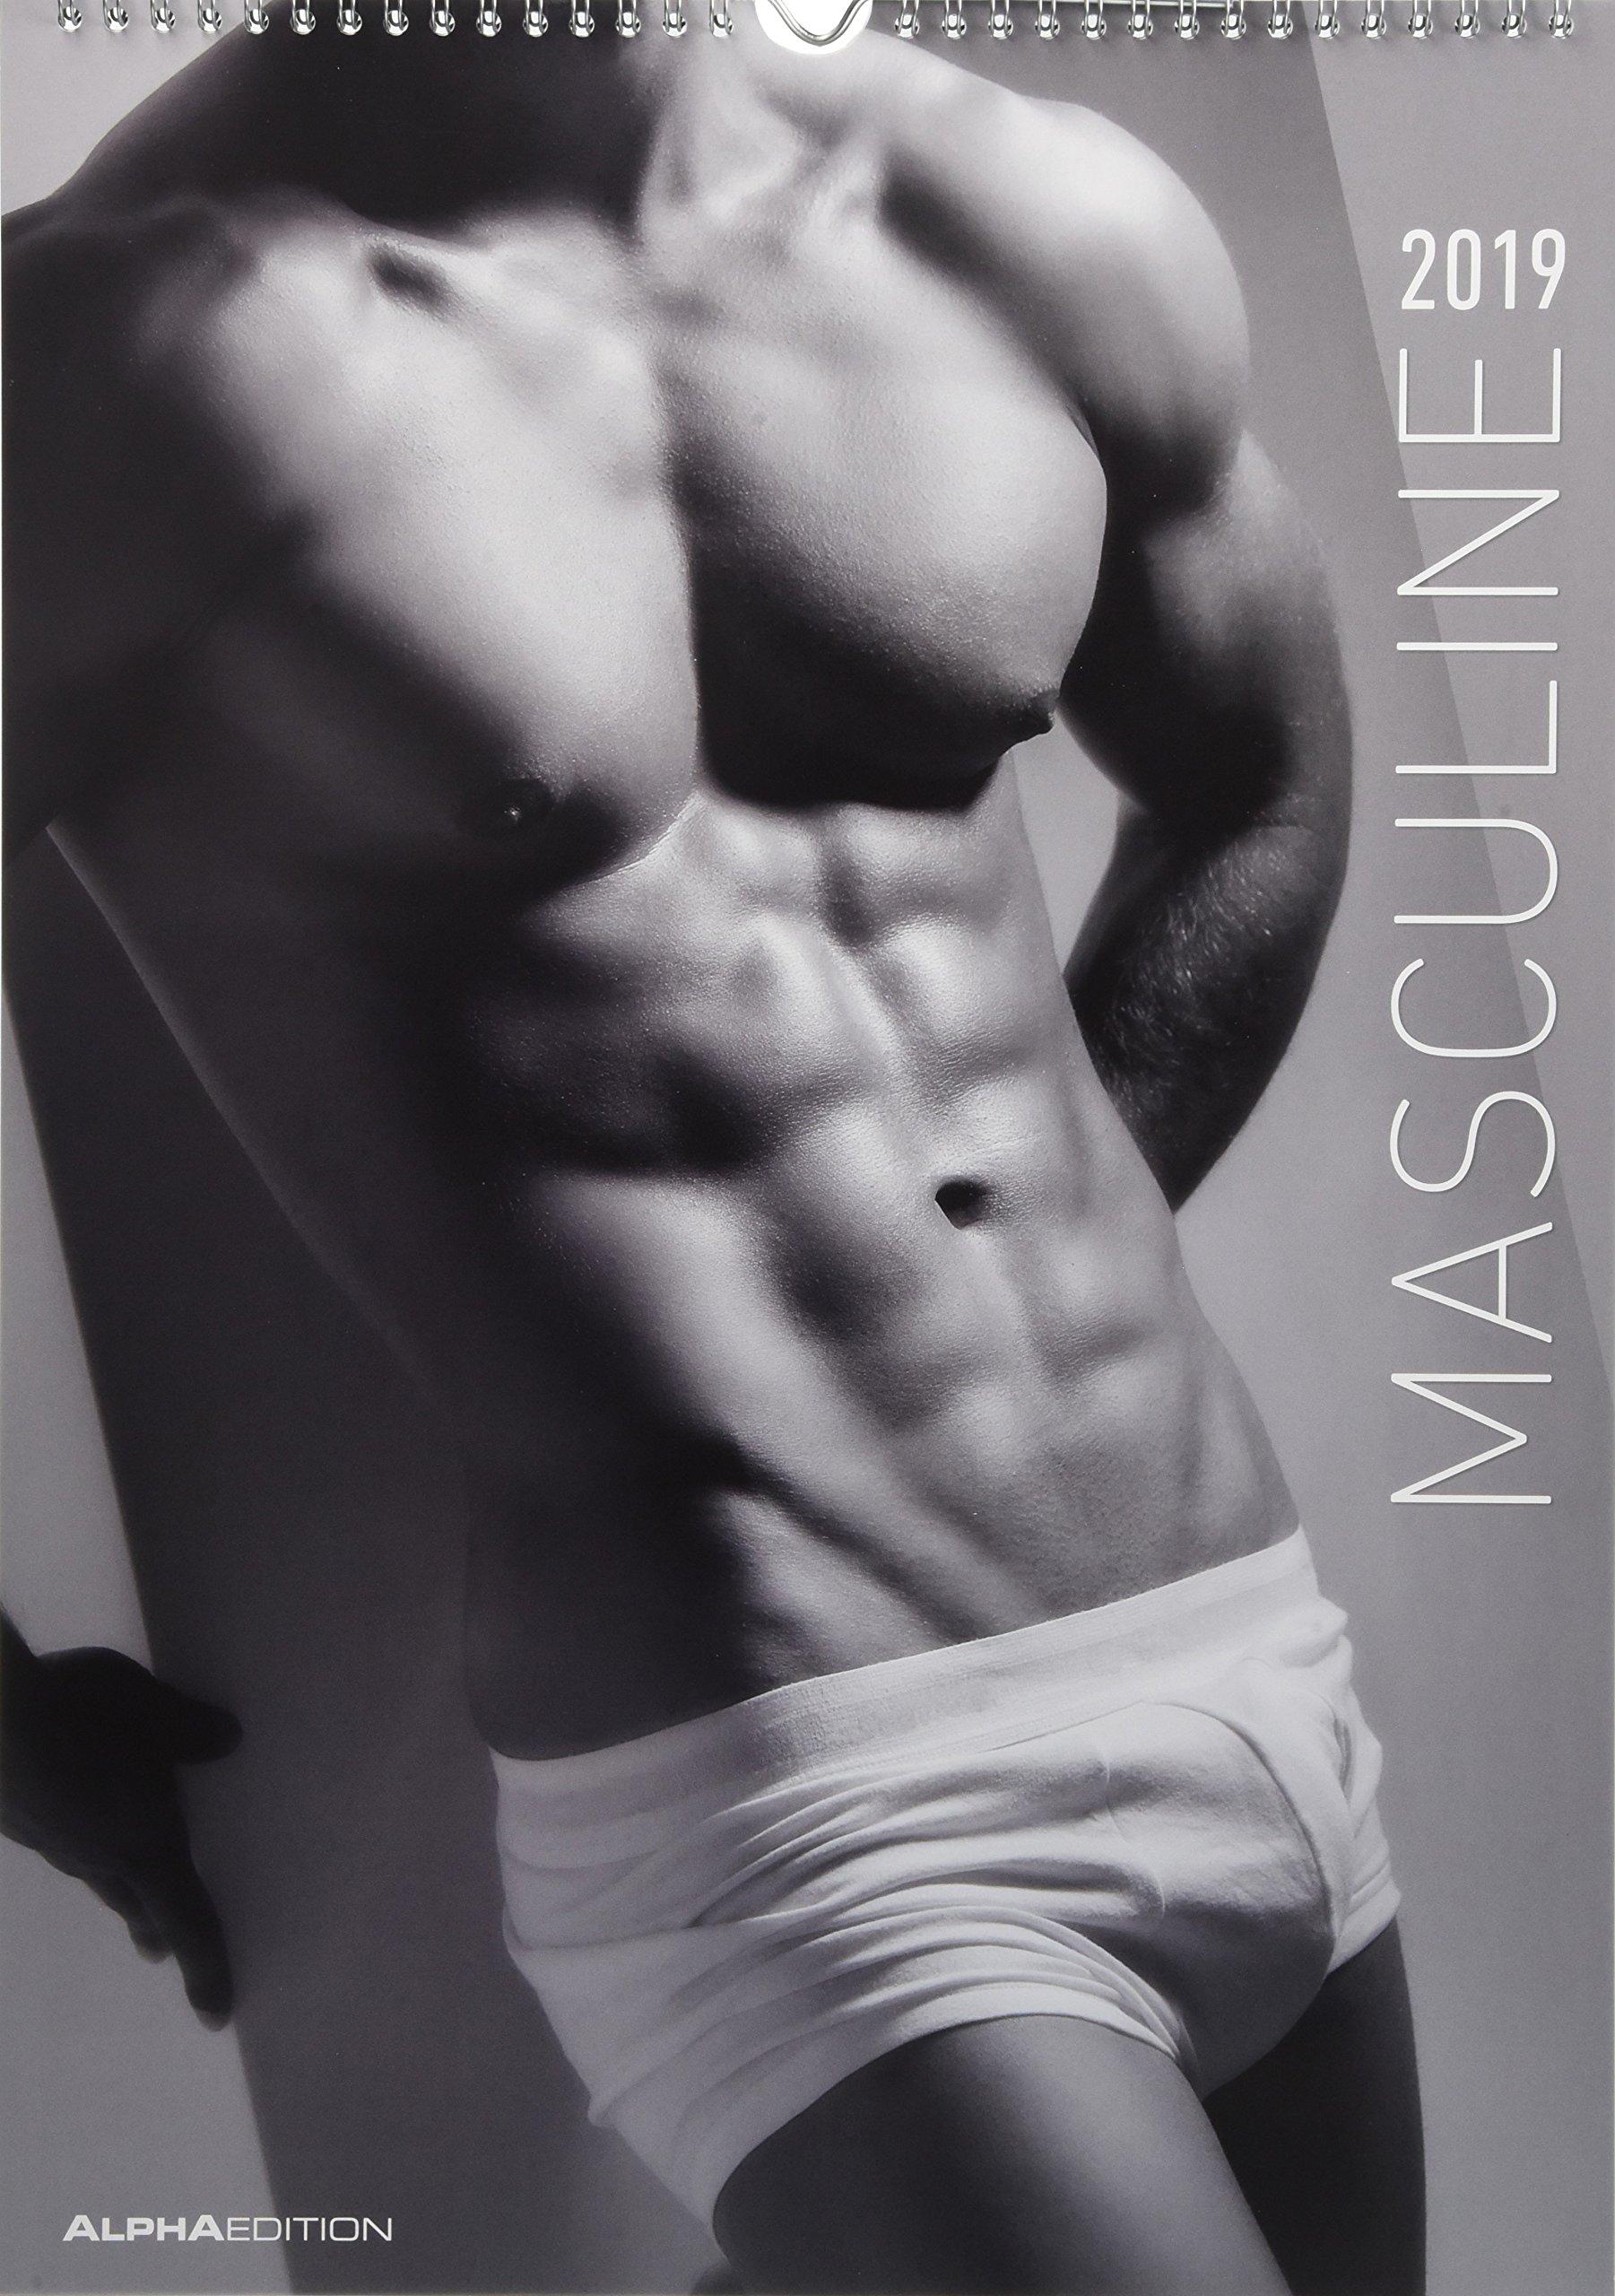 Masculine 2019 - Men - Bildkalender A3 - schwarz/weiß - Erotikkalender